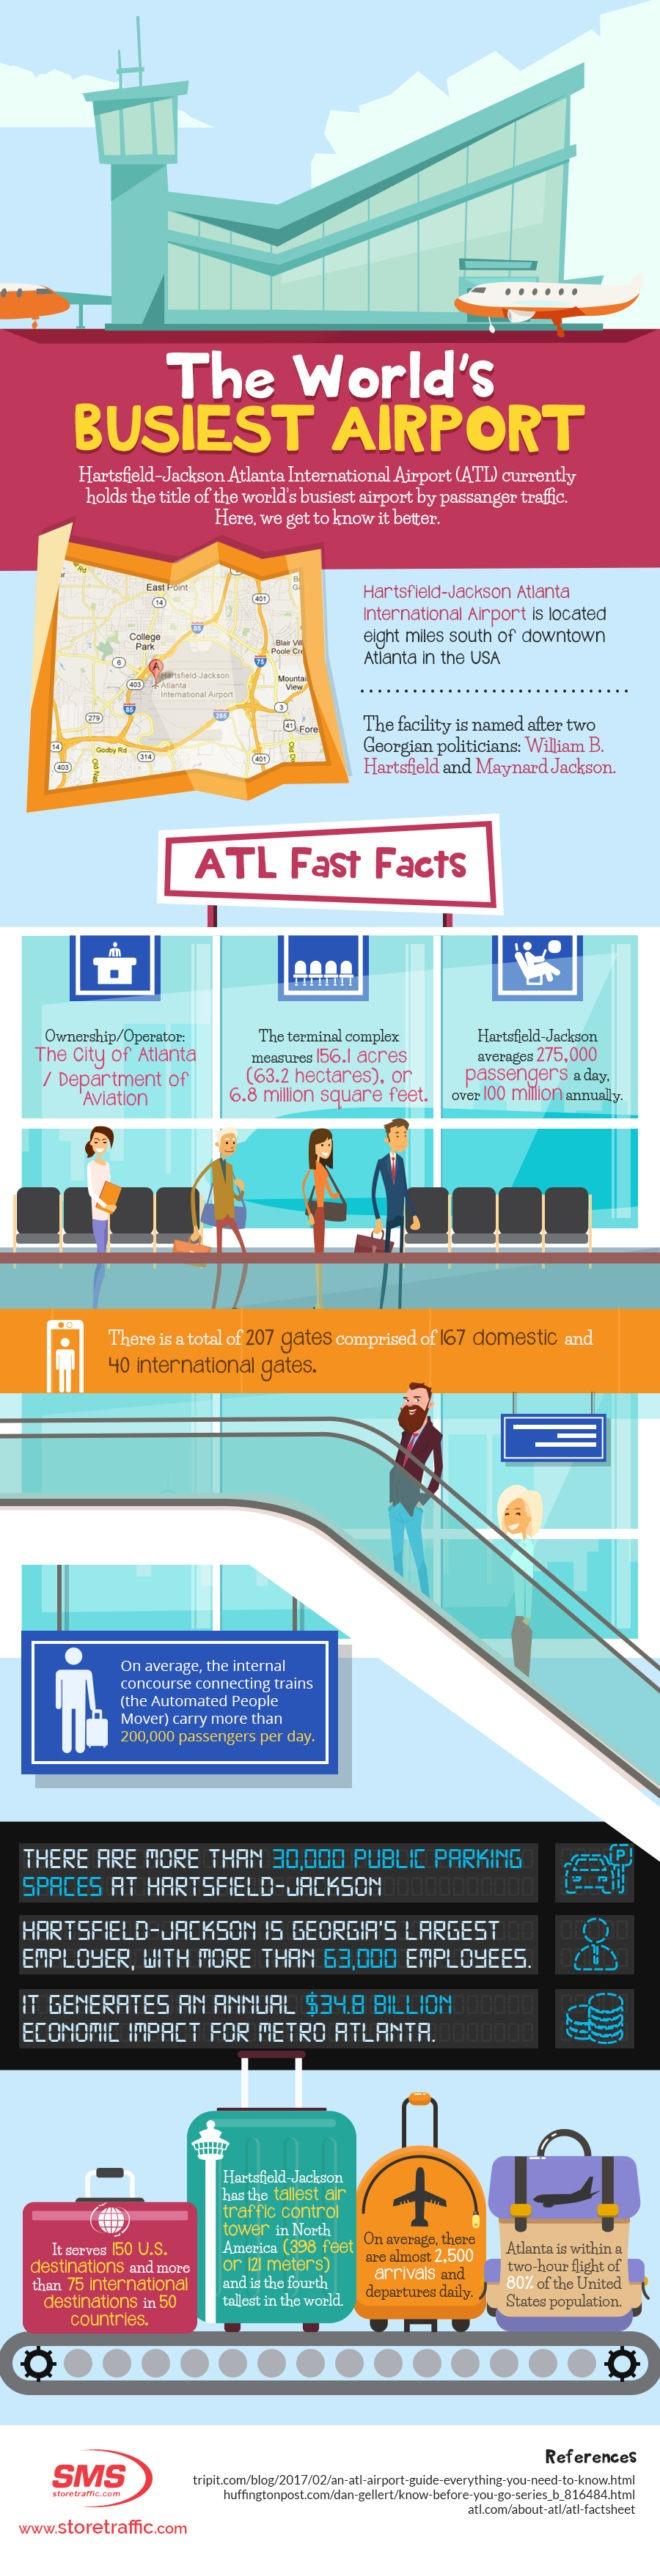 World's Busiest Airport Passengger Traffic Infographic